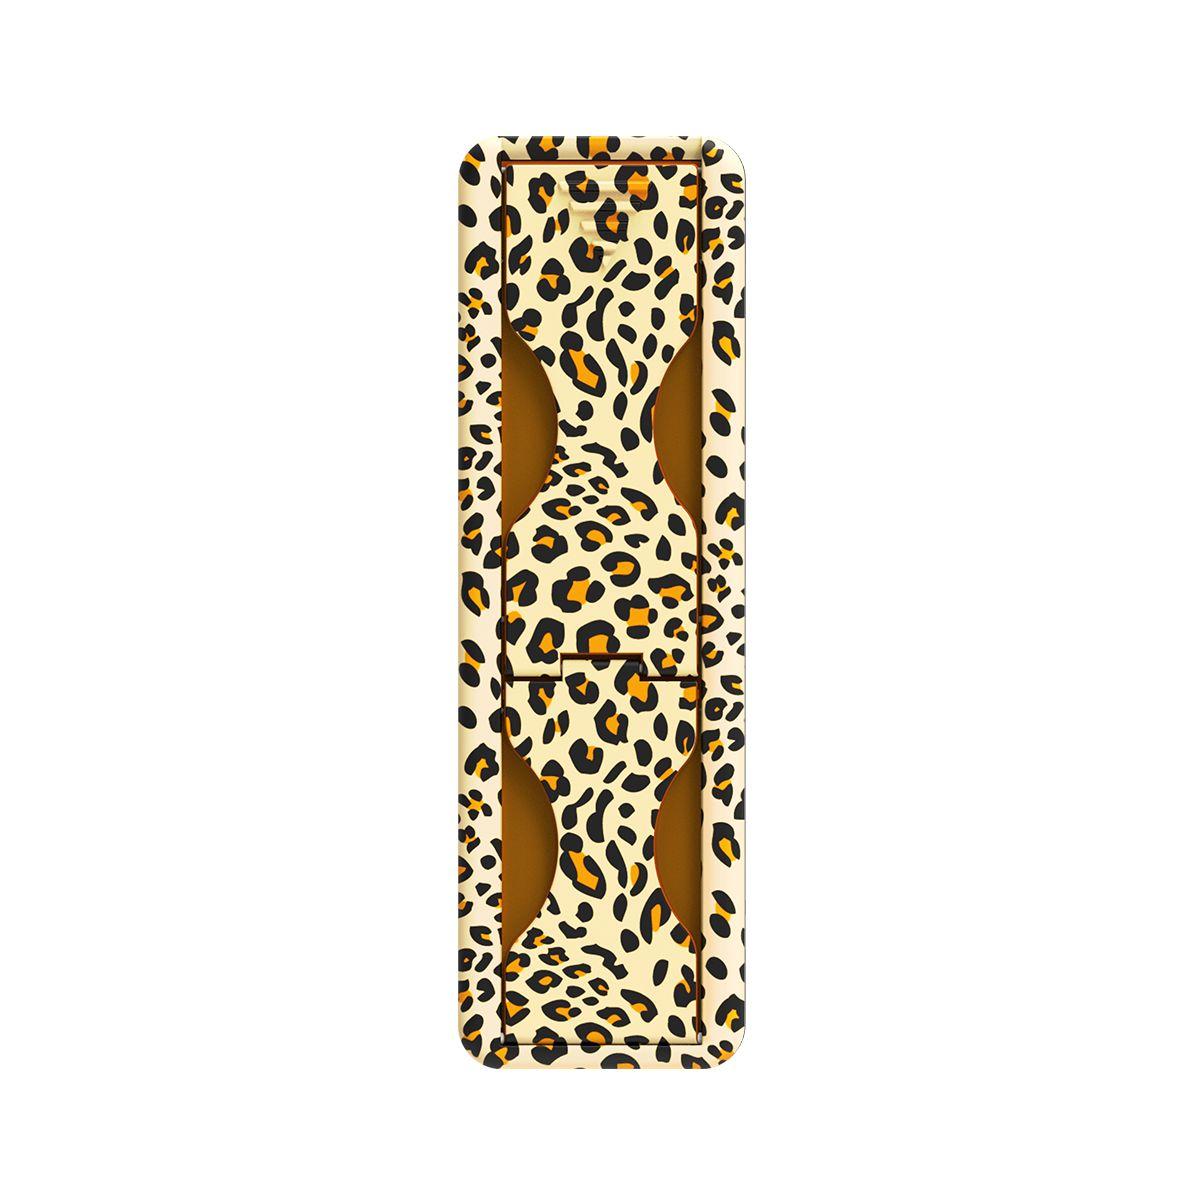 KikStik - Smartphone Kickstand - Cheetah